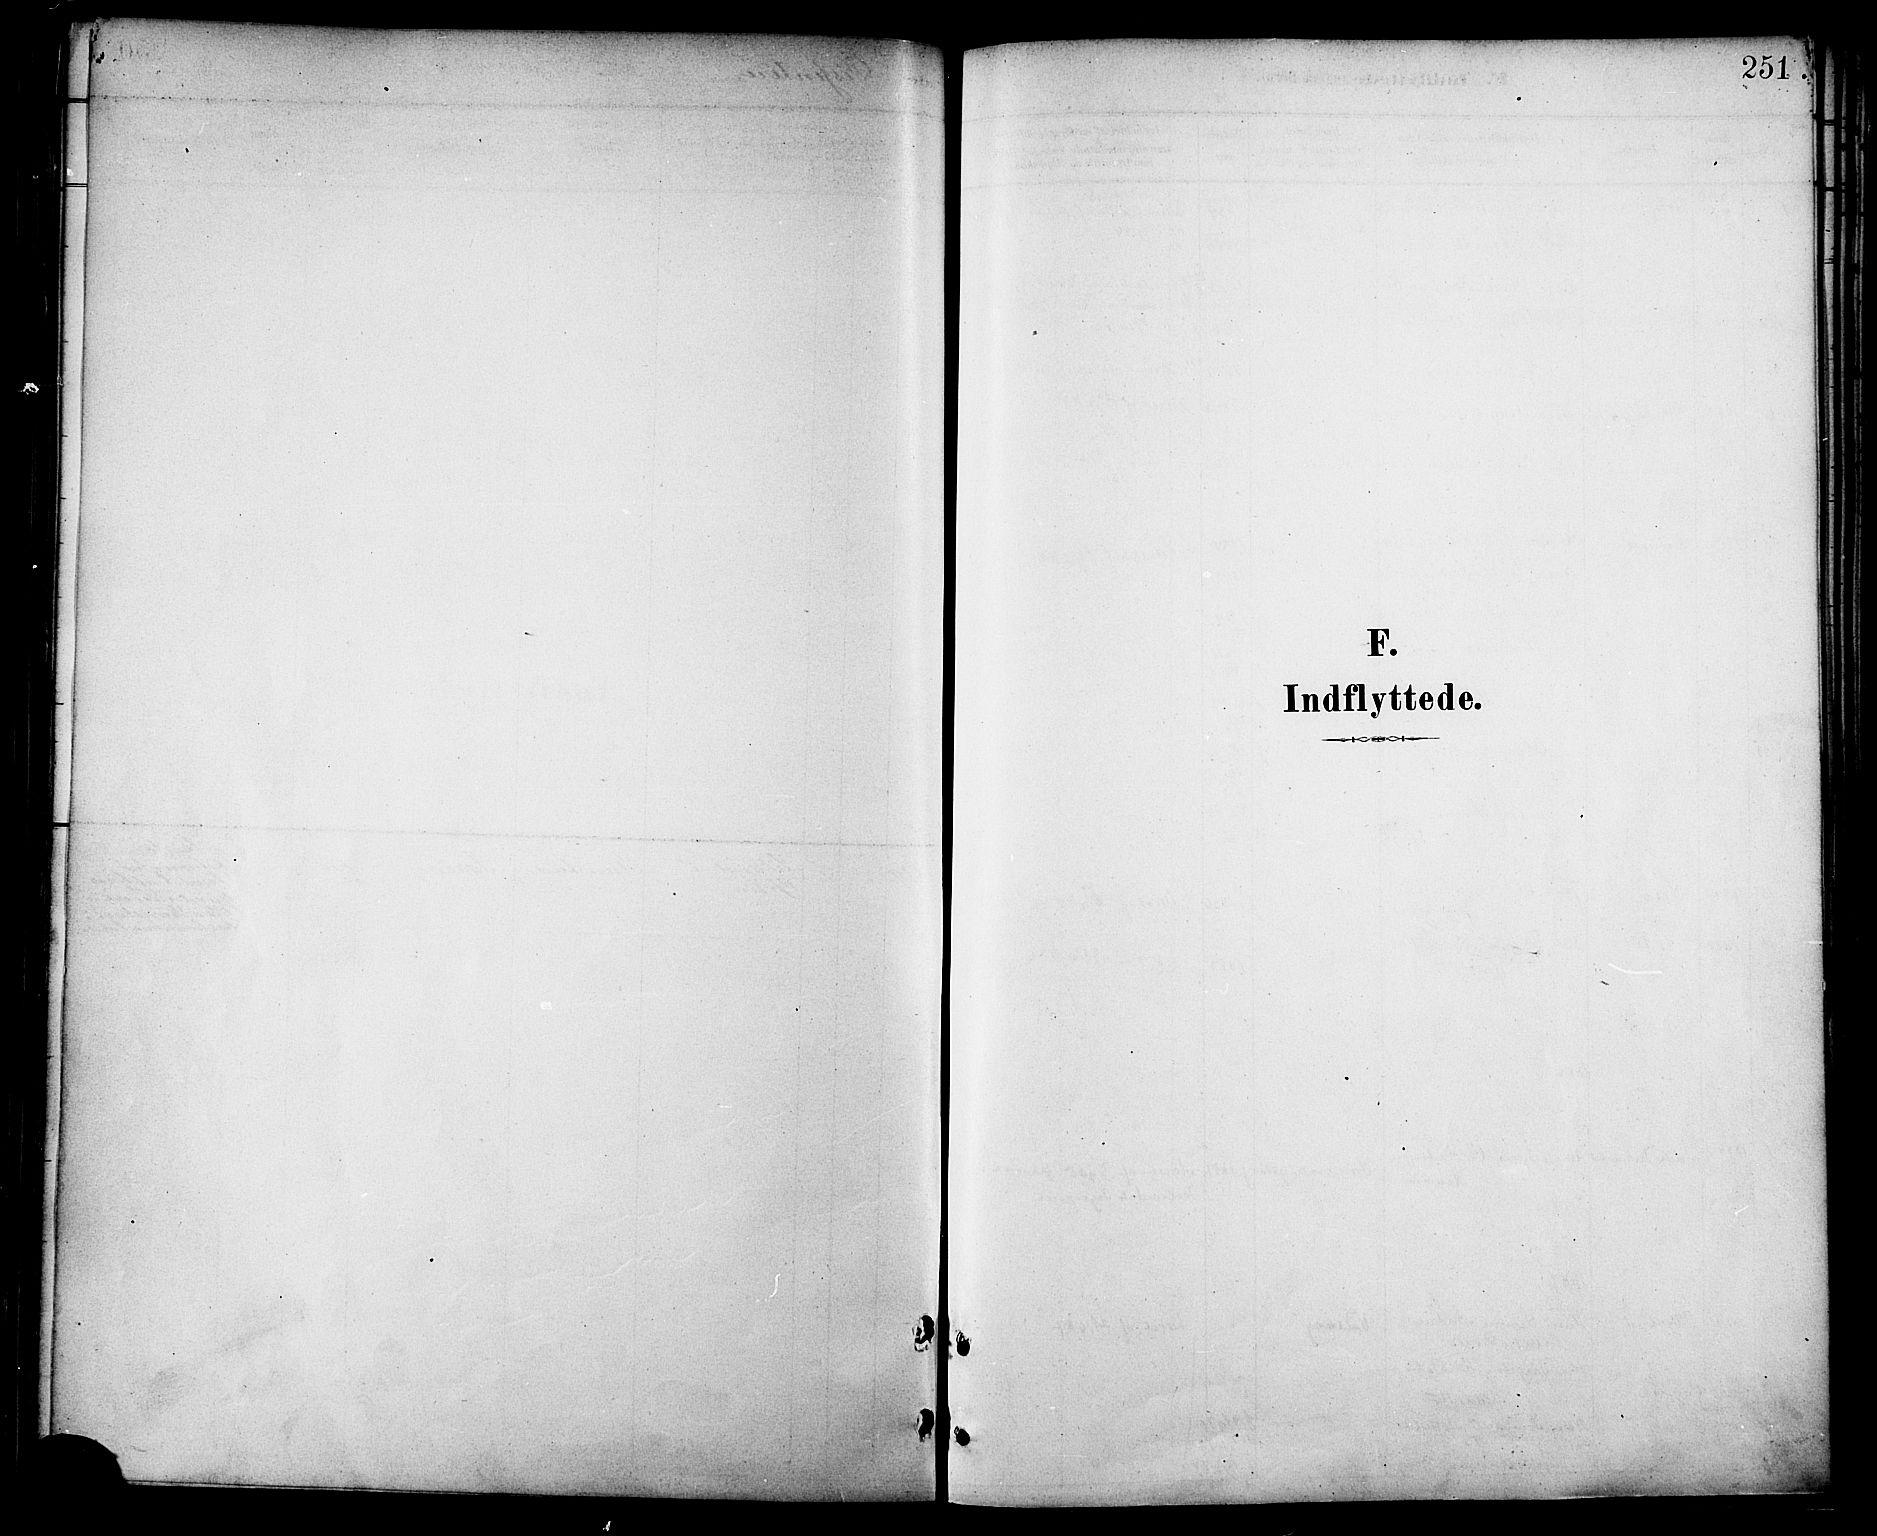 SAT, Ministerialprotokoller, klokkerbøker og fødselsregistre - Nordland, 872/L1035: Ministerialbok nr. 872A10, 1884-1896, s. 251